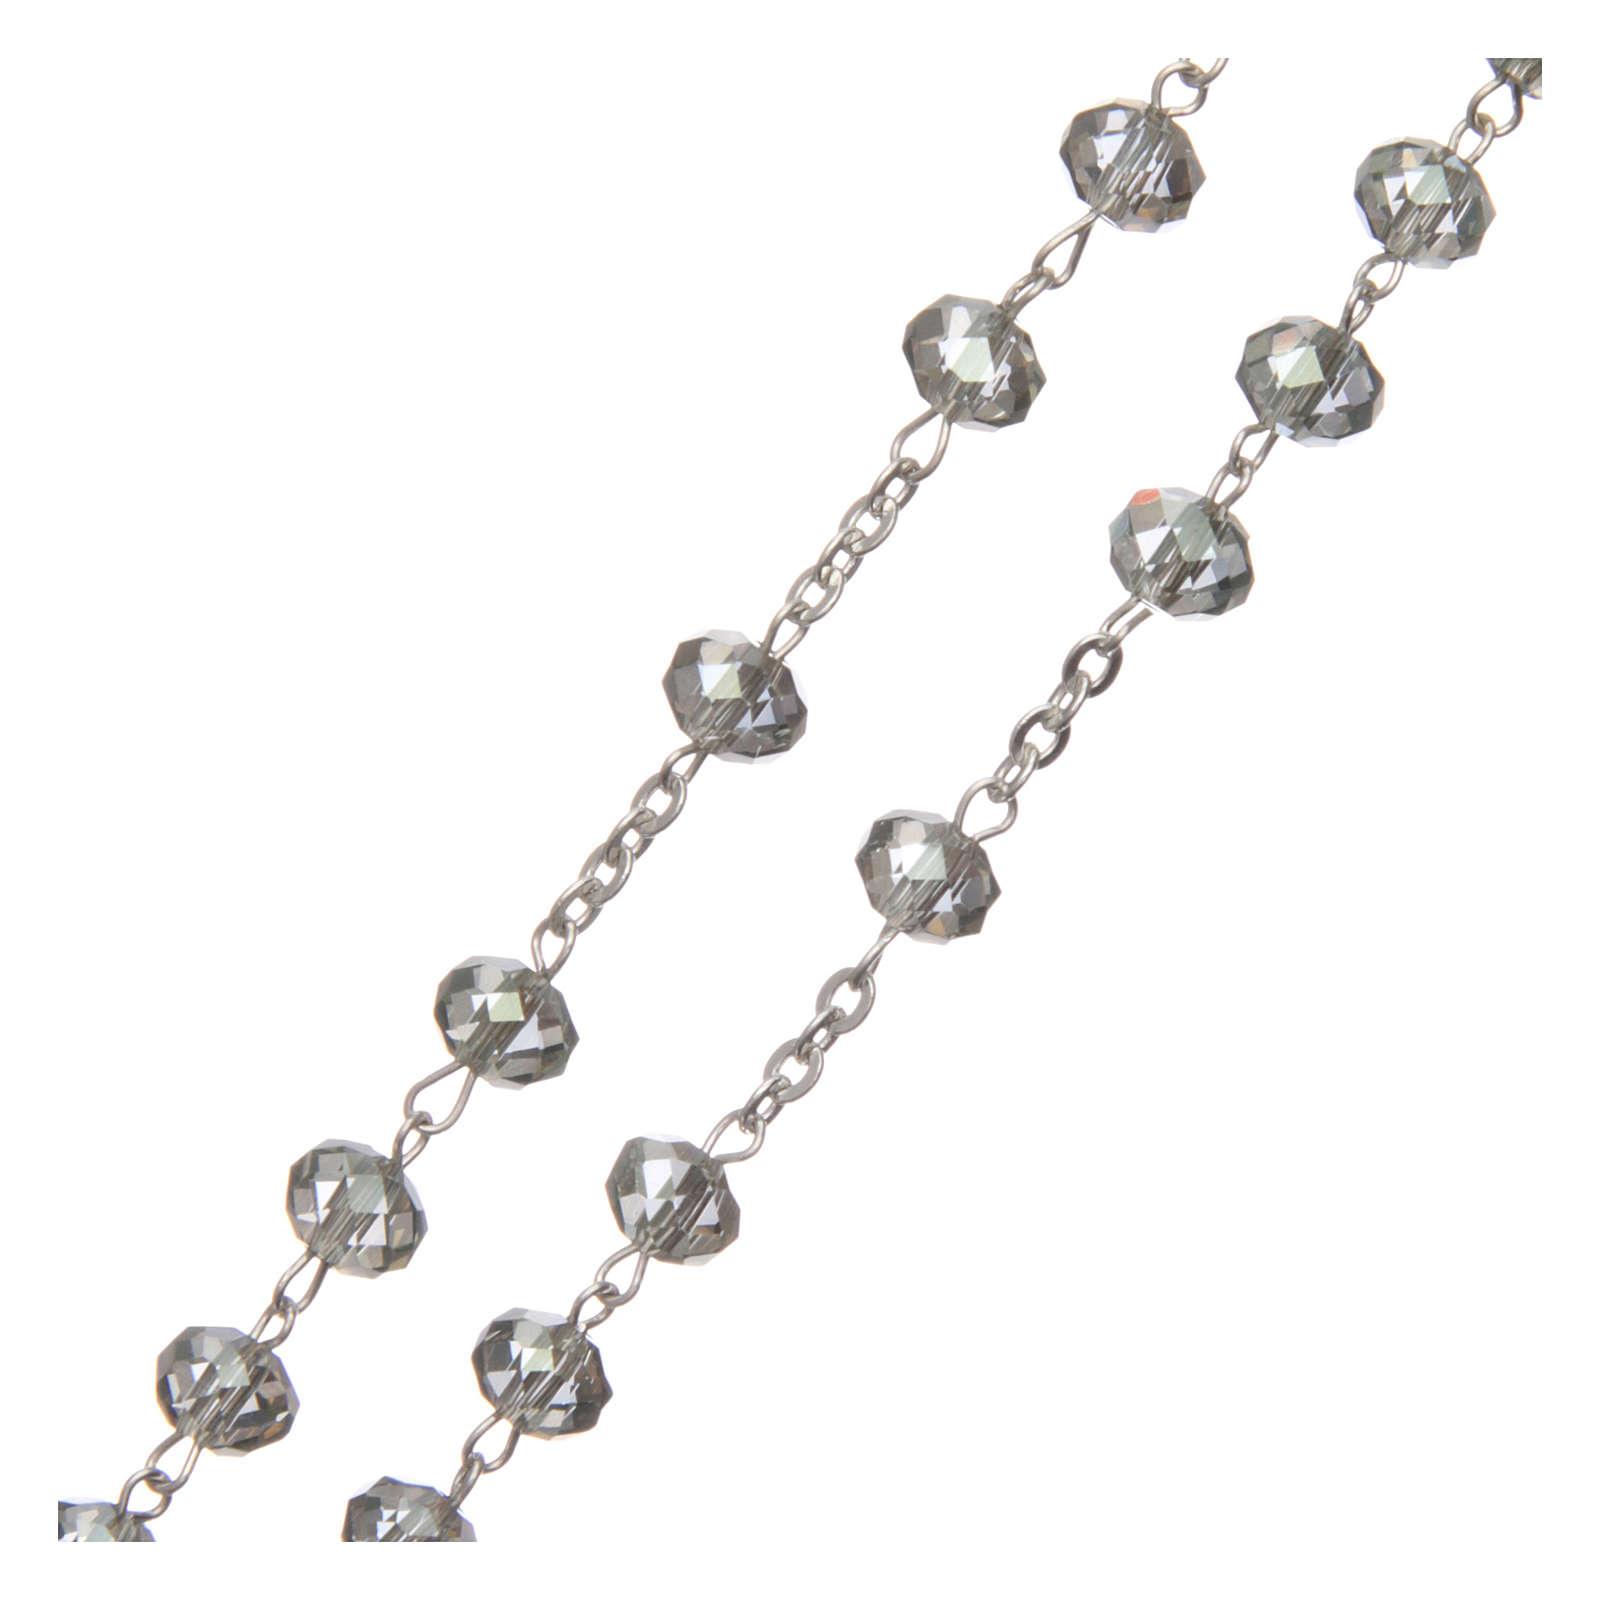 Rosario cristallo 6 mm legatura argento 925 4